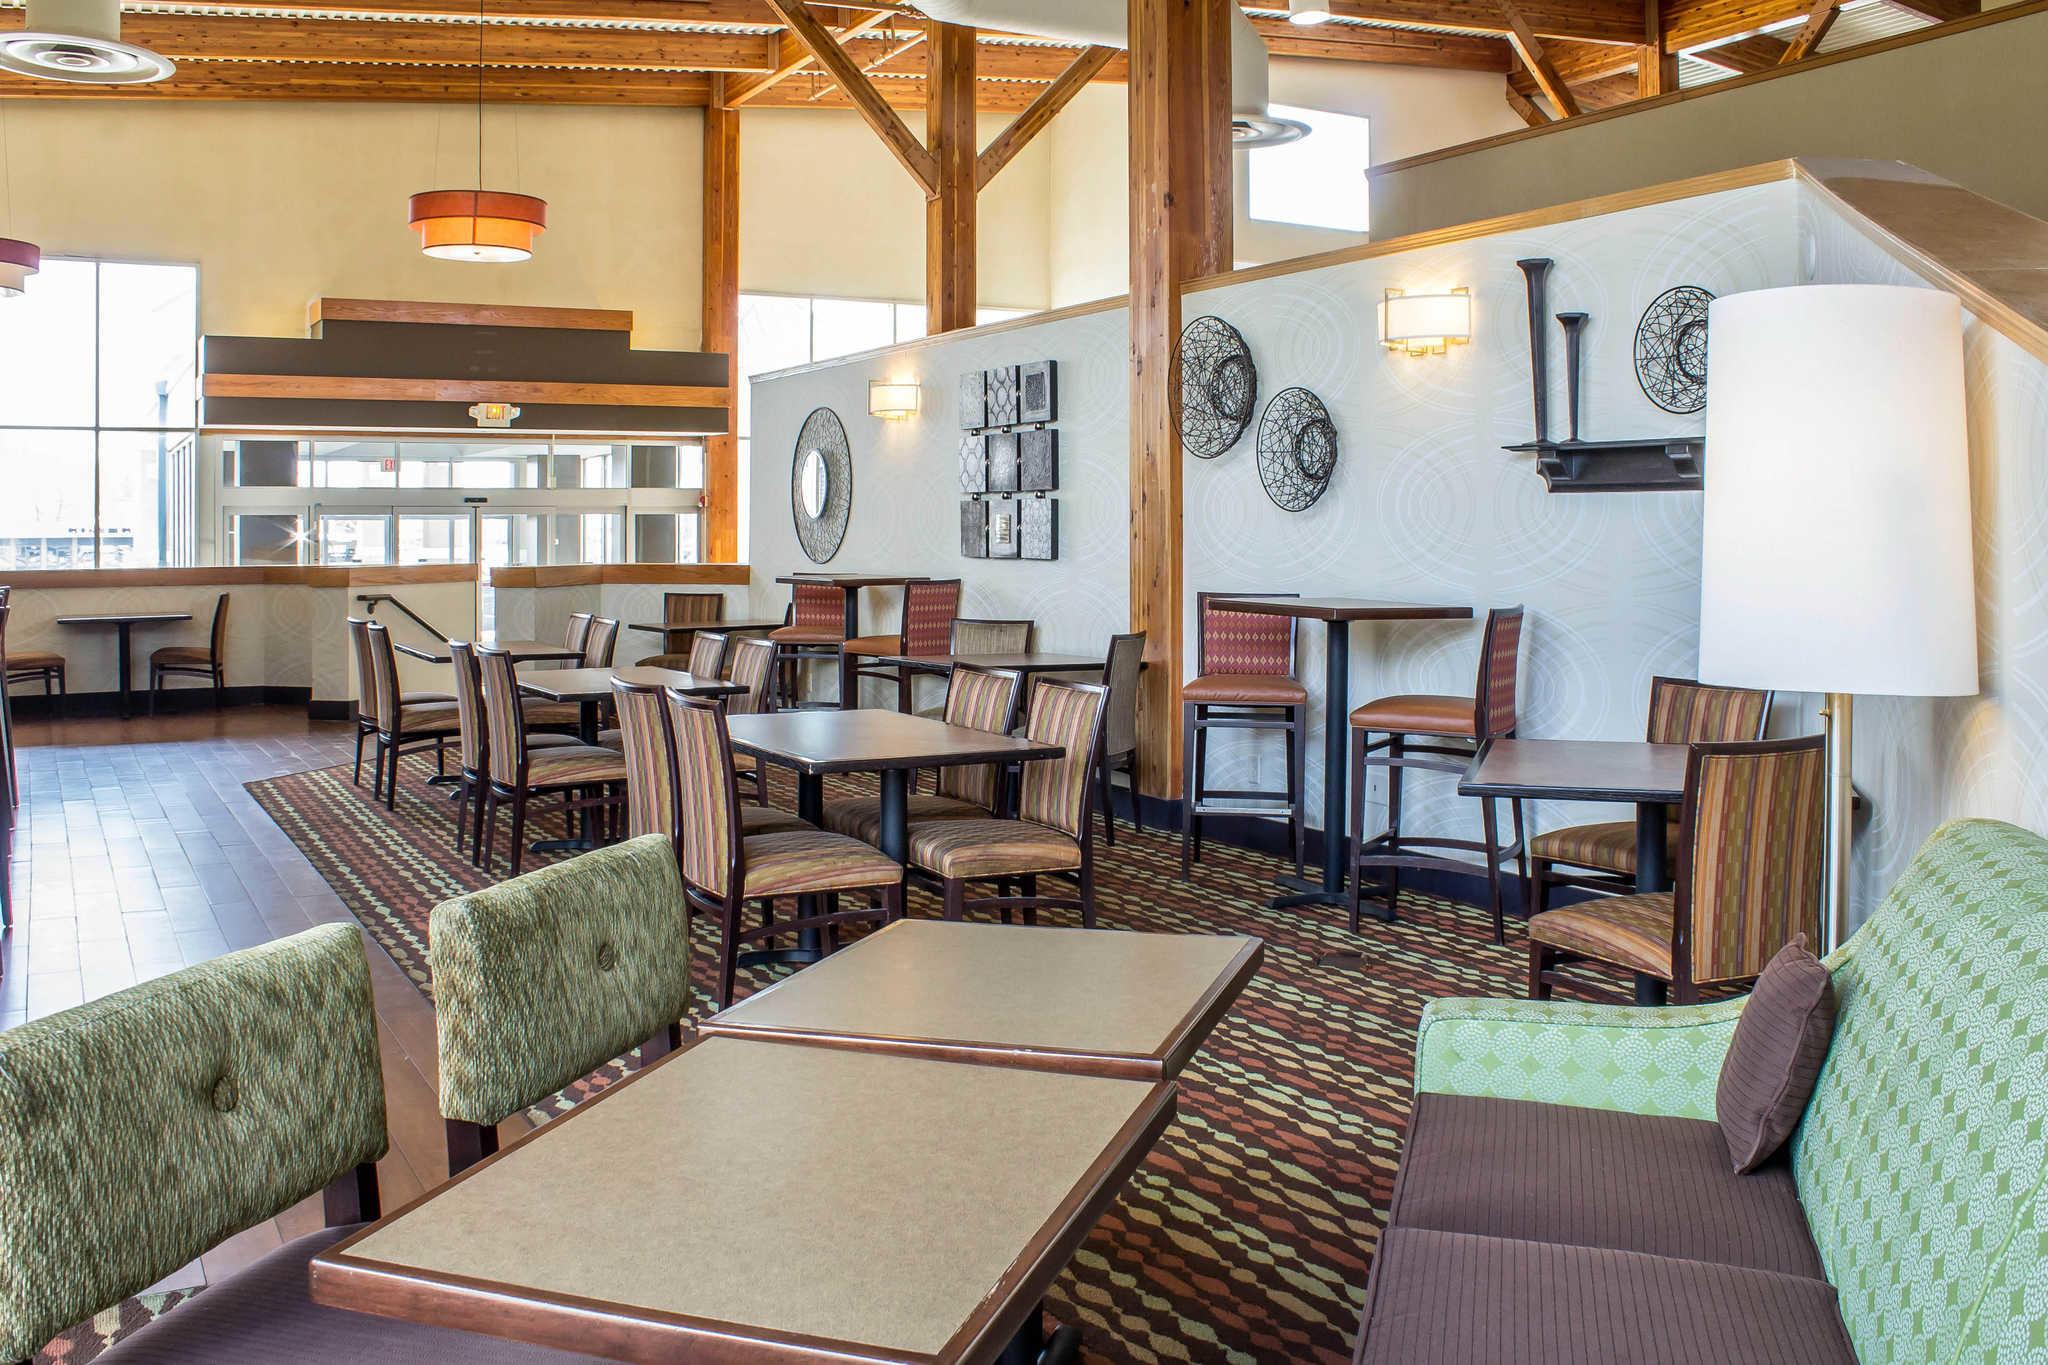 Clarion Inn University Plaza image 32